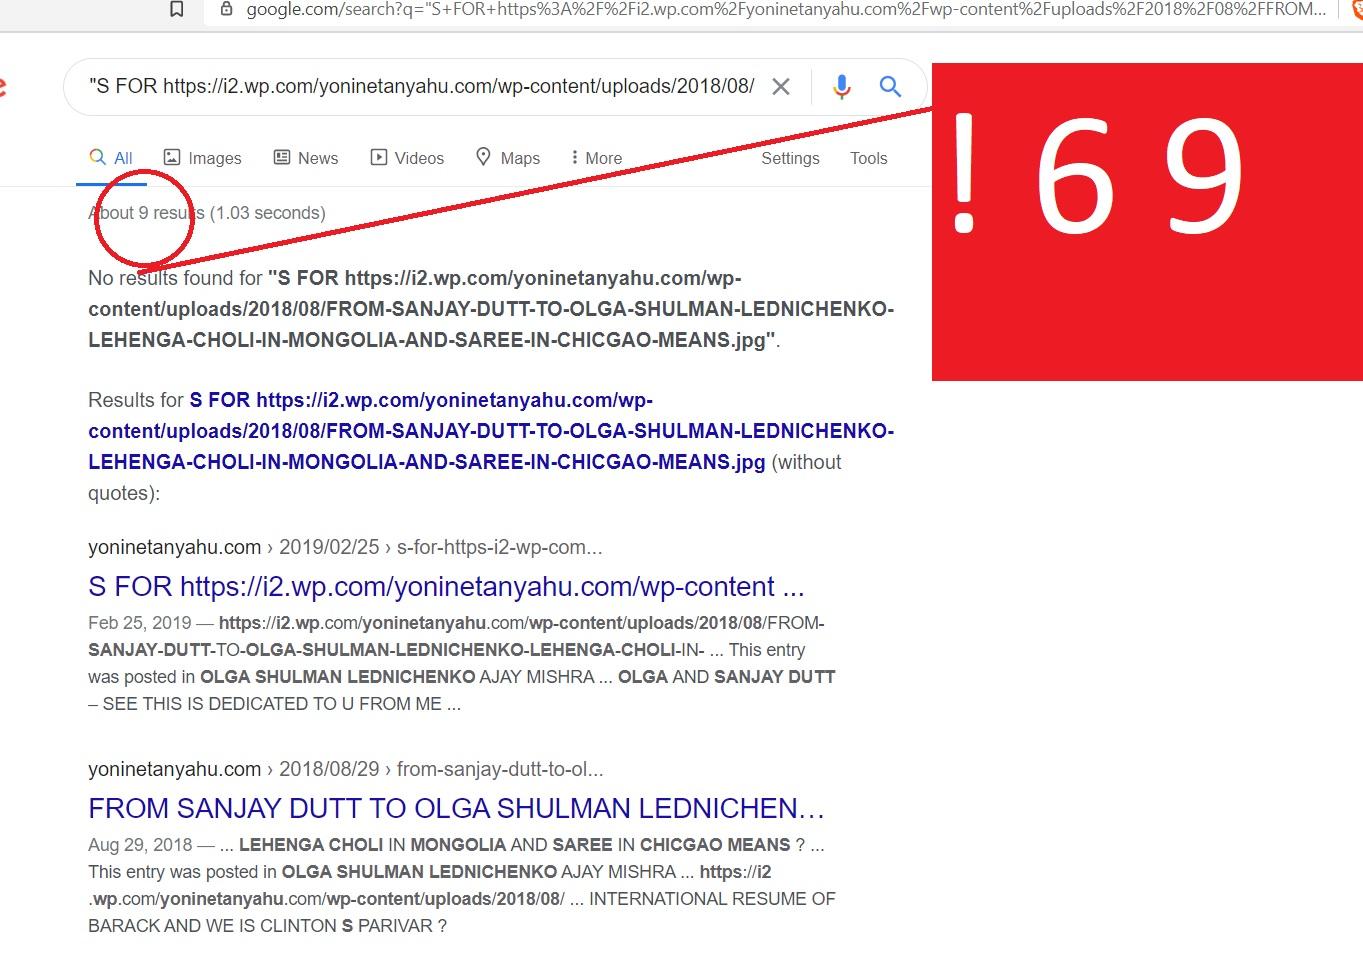 """S FOR https://i2.wp.com/yoninetanyahu.com/wp-content/uploads/2018/08/FROM-SANJAY-DUTT-TO-OLGA-SHULMAN-LEDNICHENKO-LEHENGA-CHOLI-IN-MONGOLIA-AND-SAREE-IN-CHICGAO-MEANS.jpg"""